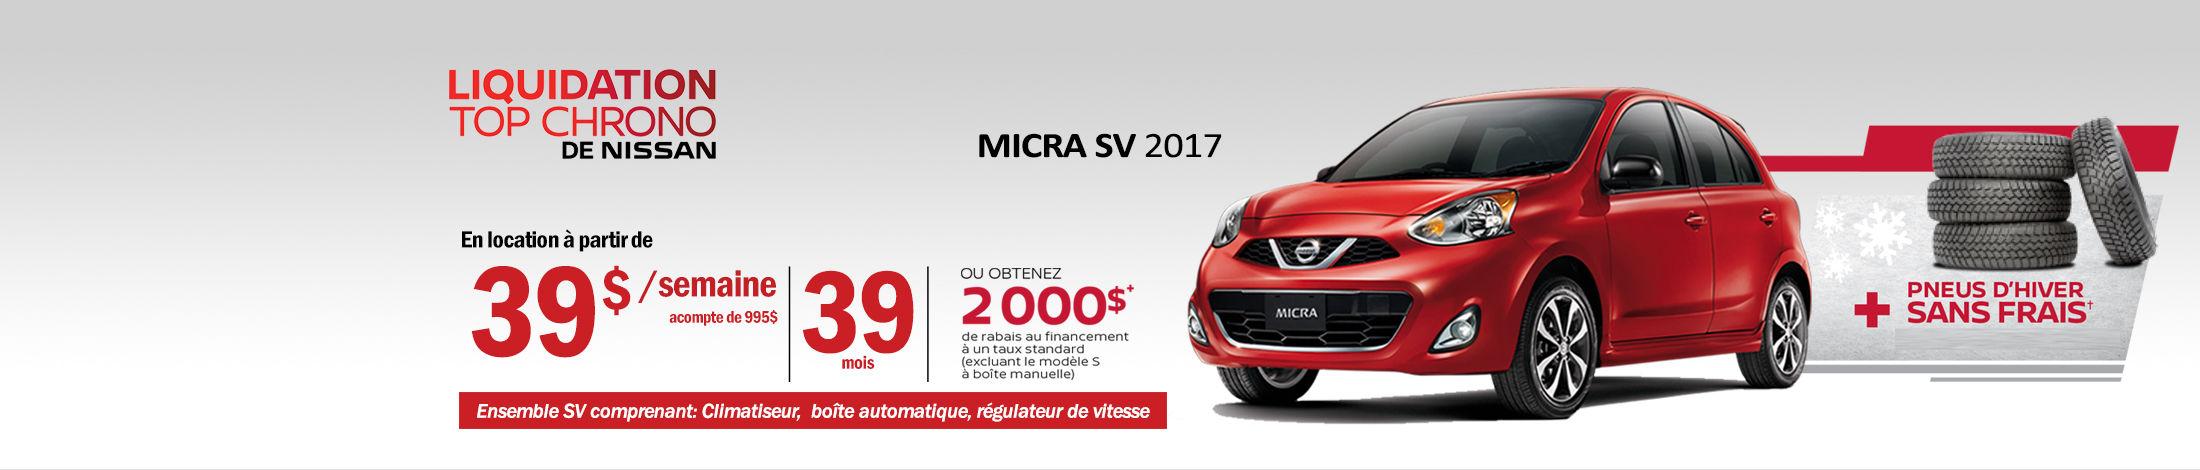 Nissan Micra Promotion septembre - Banner